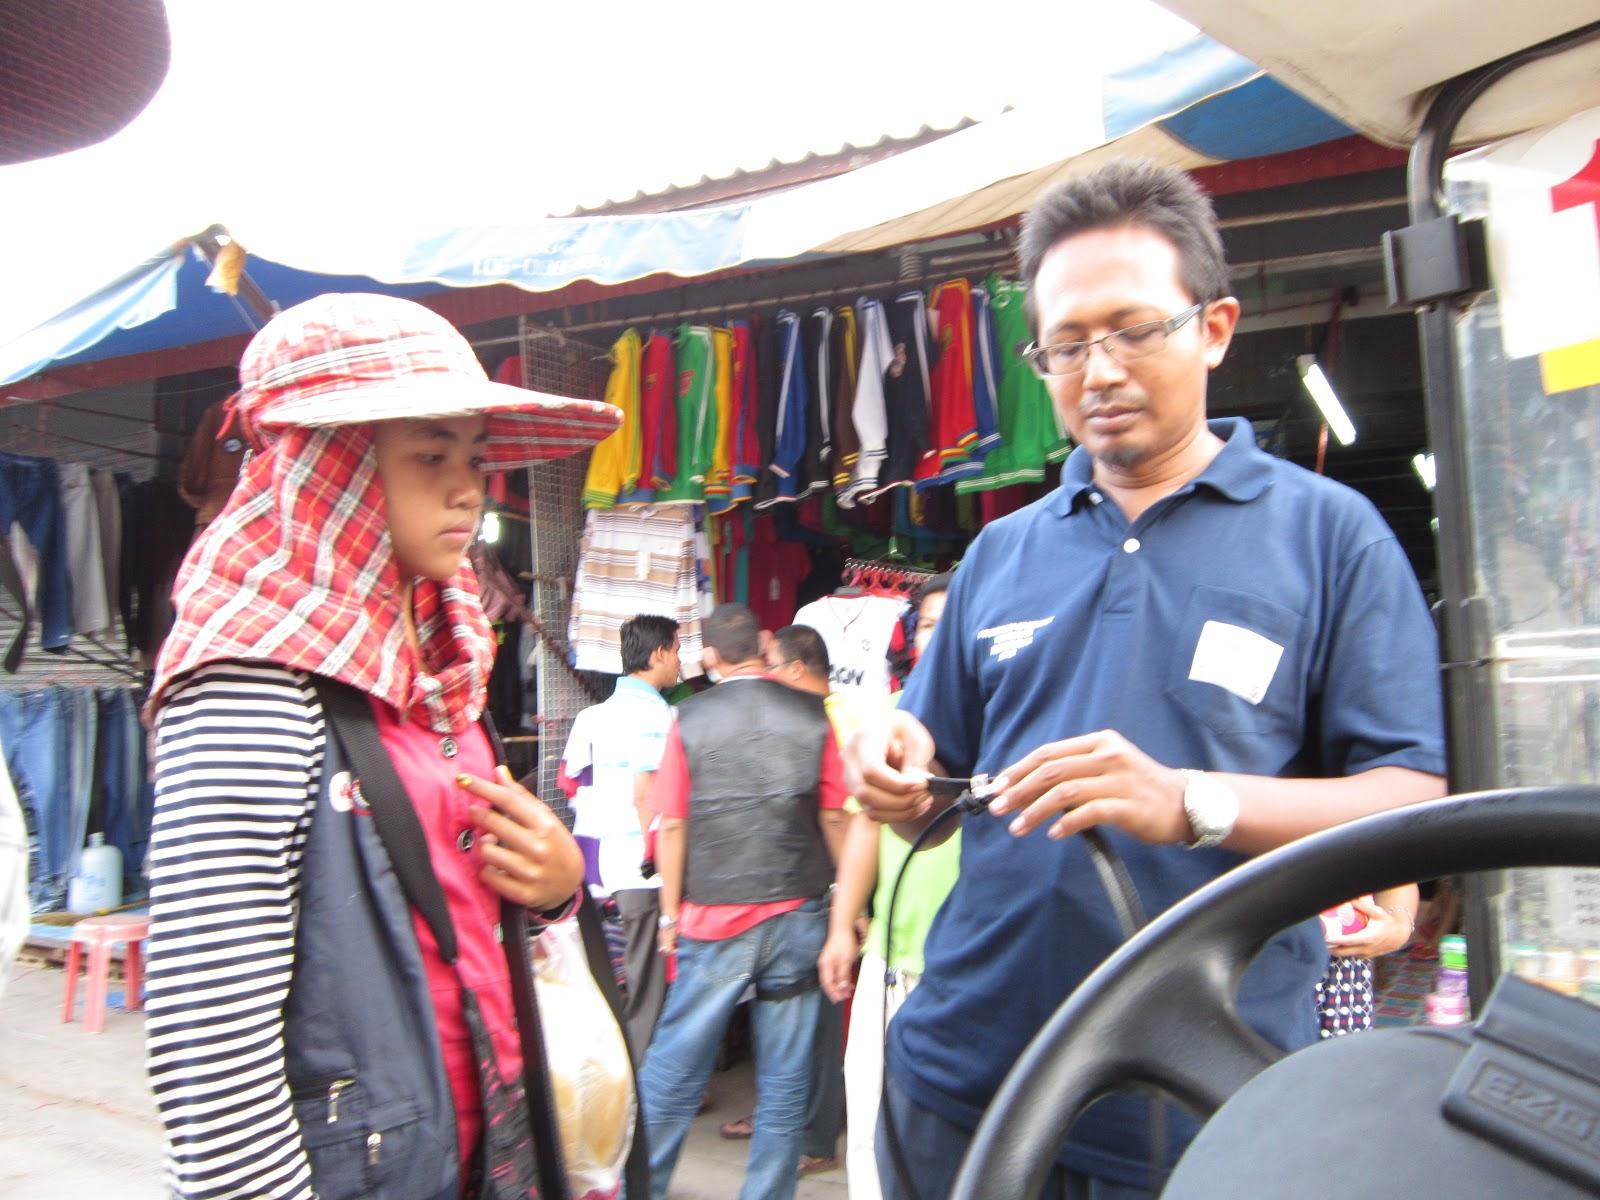 Poipet cambodia girls - Bobs and Vagene